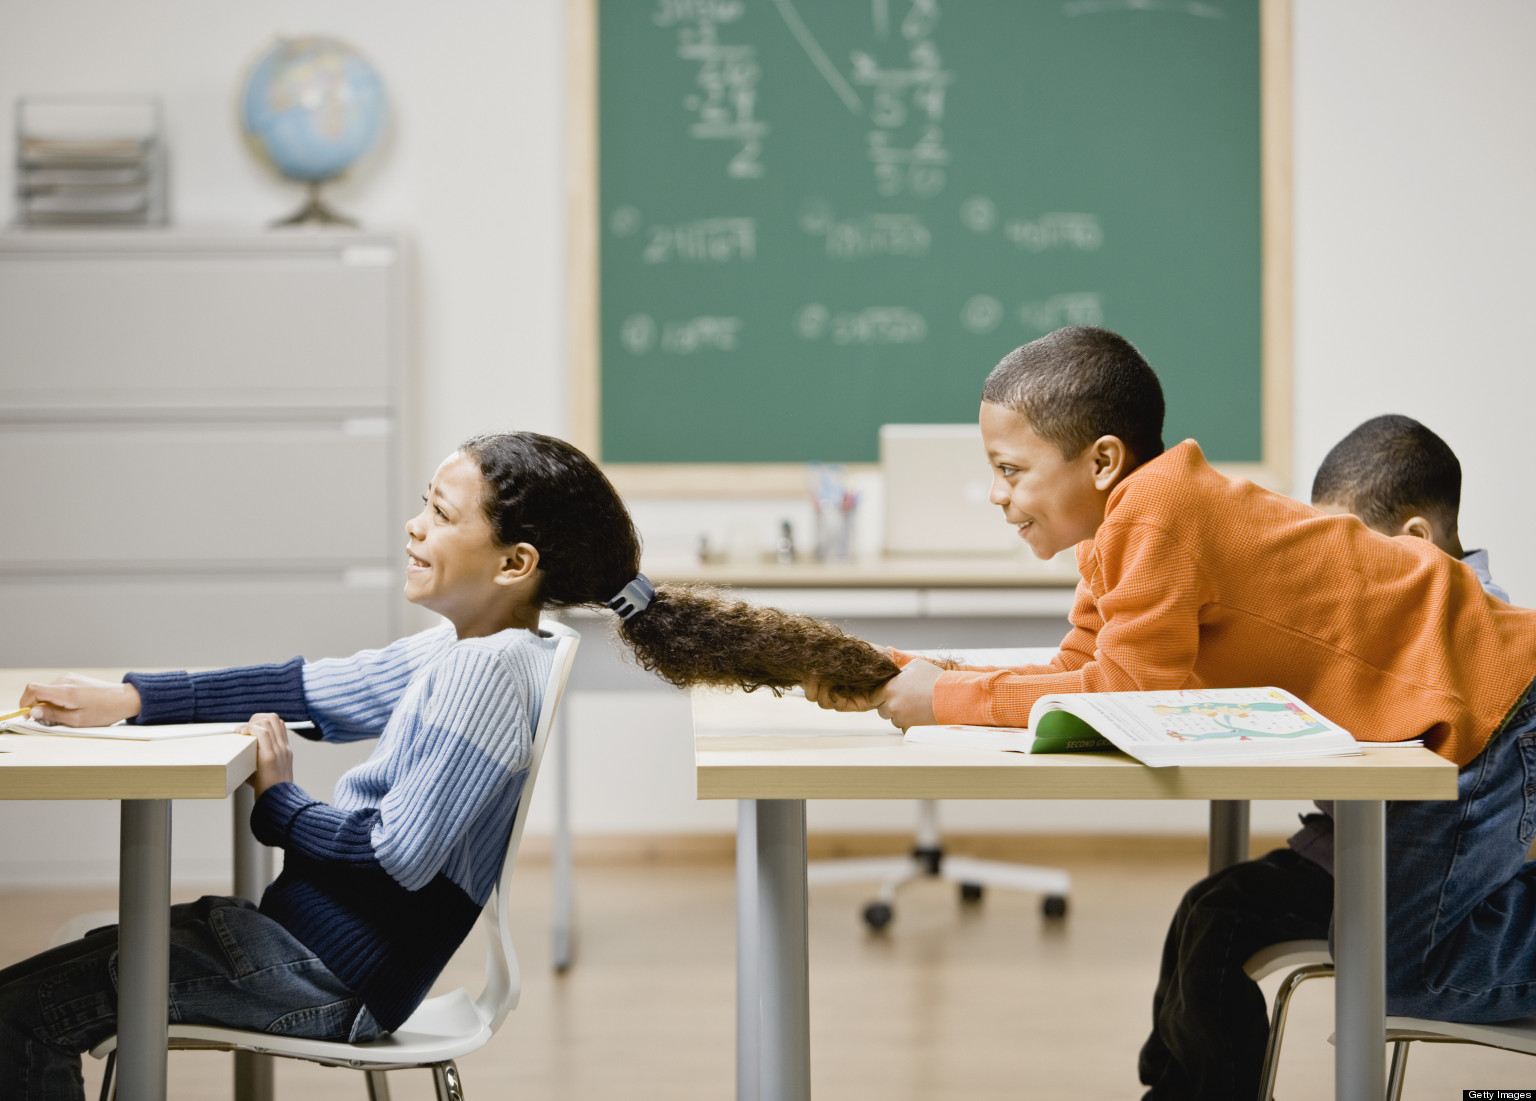 bullying in us schools